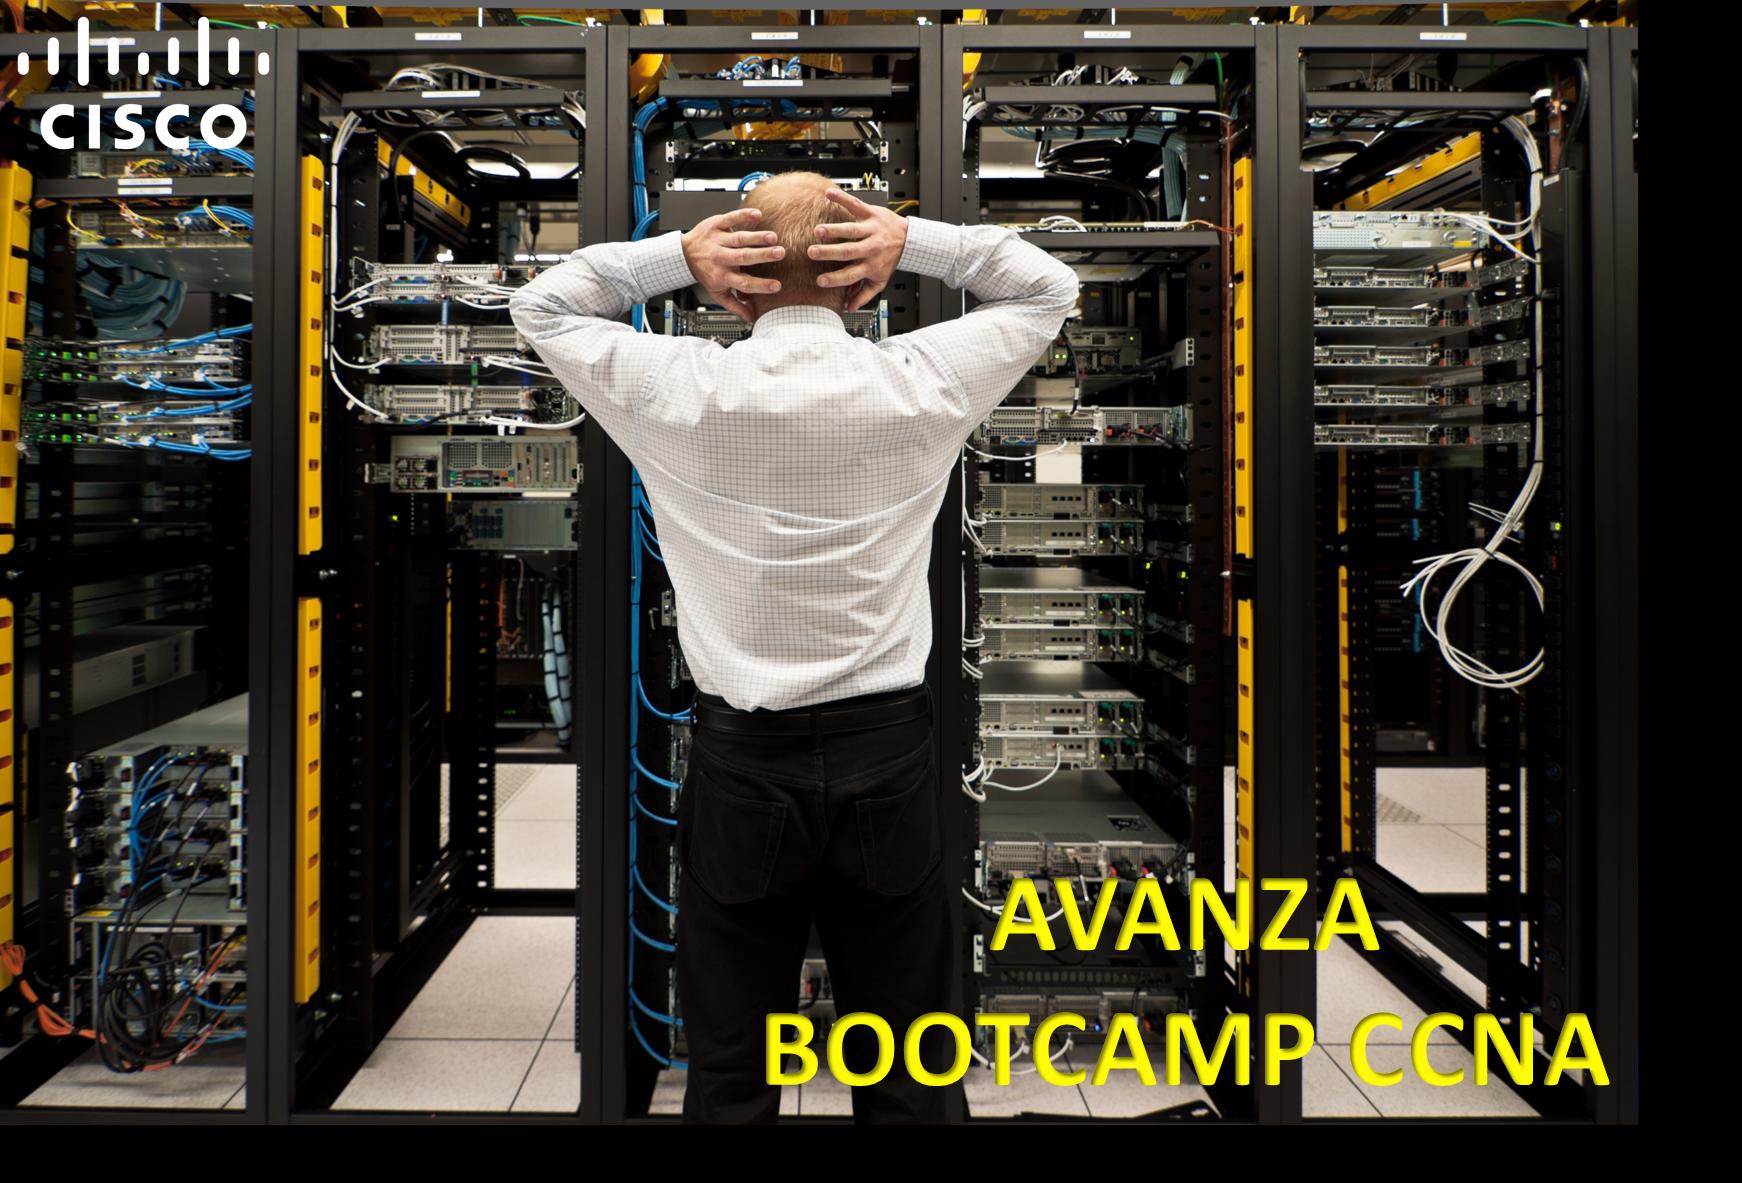 Bootcamp CCNA